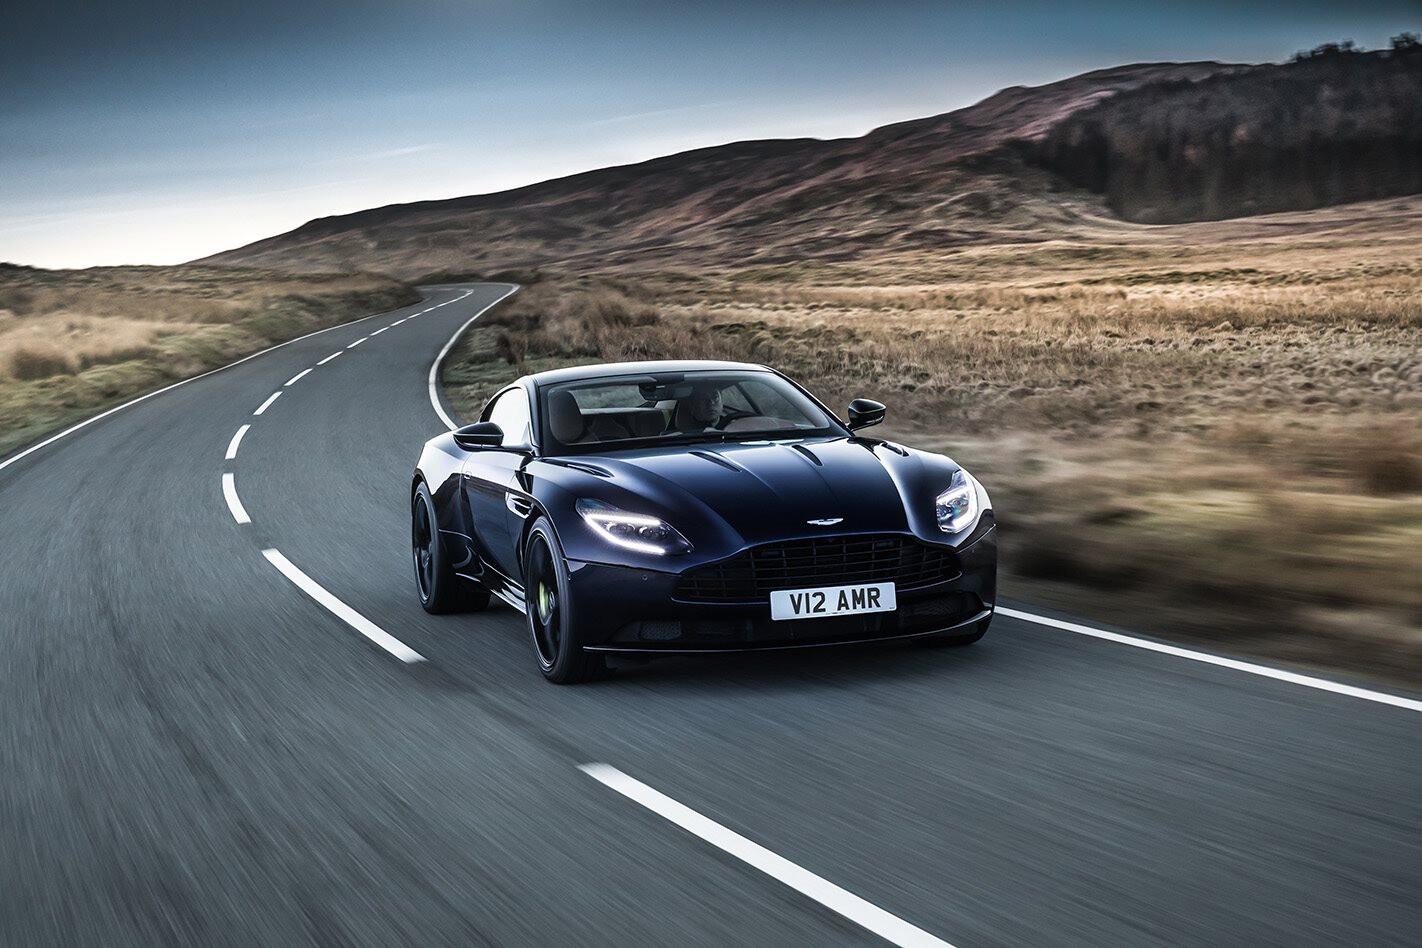 Aston Martin Db 11 Amr 3 Jpeg Web Jpg